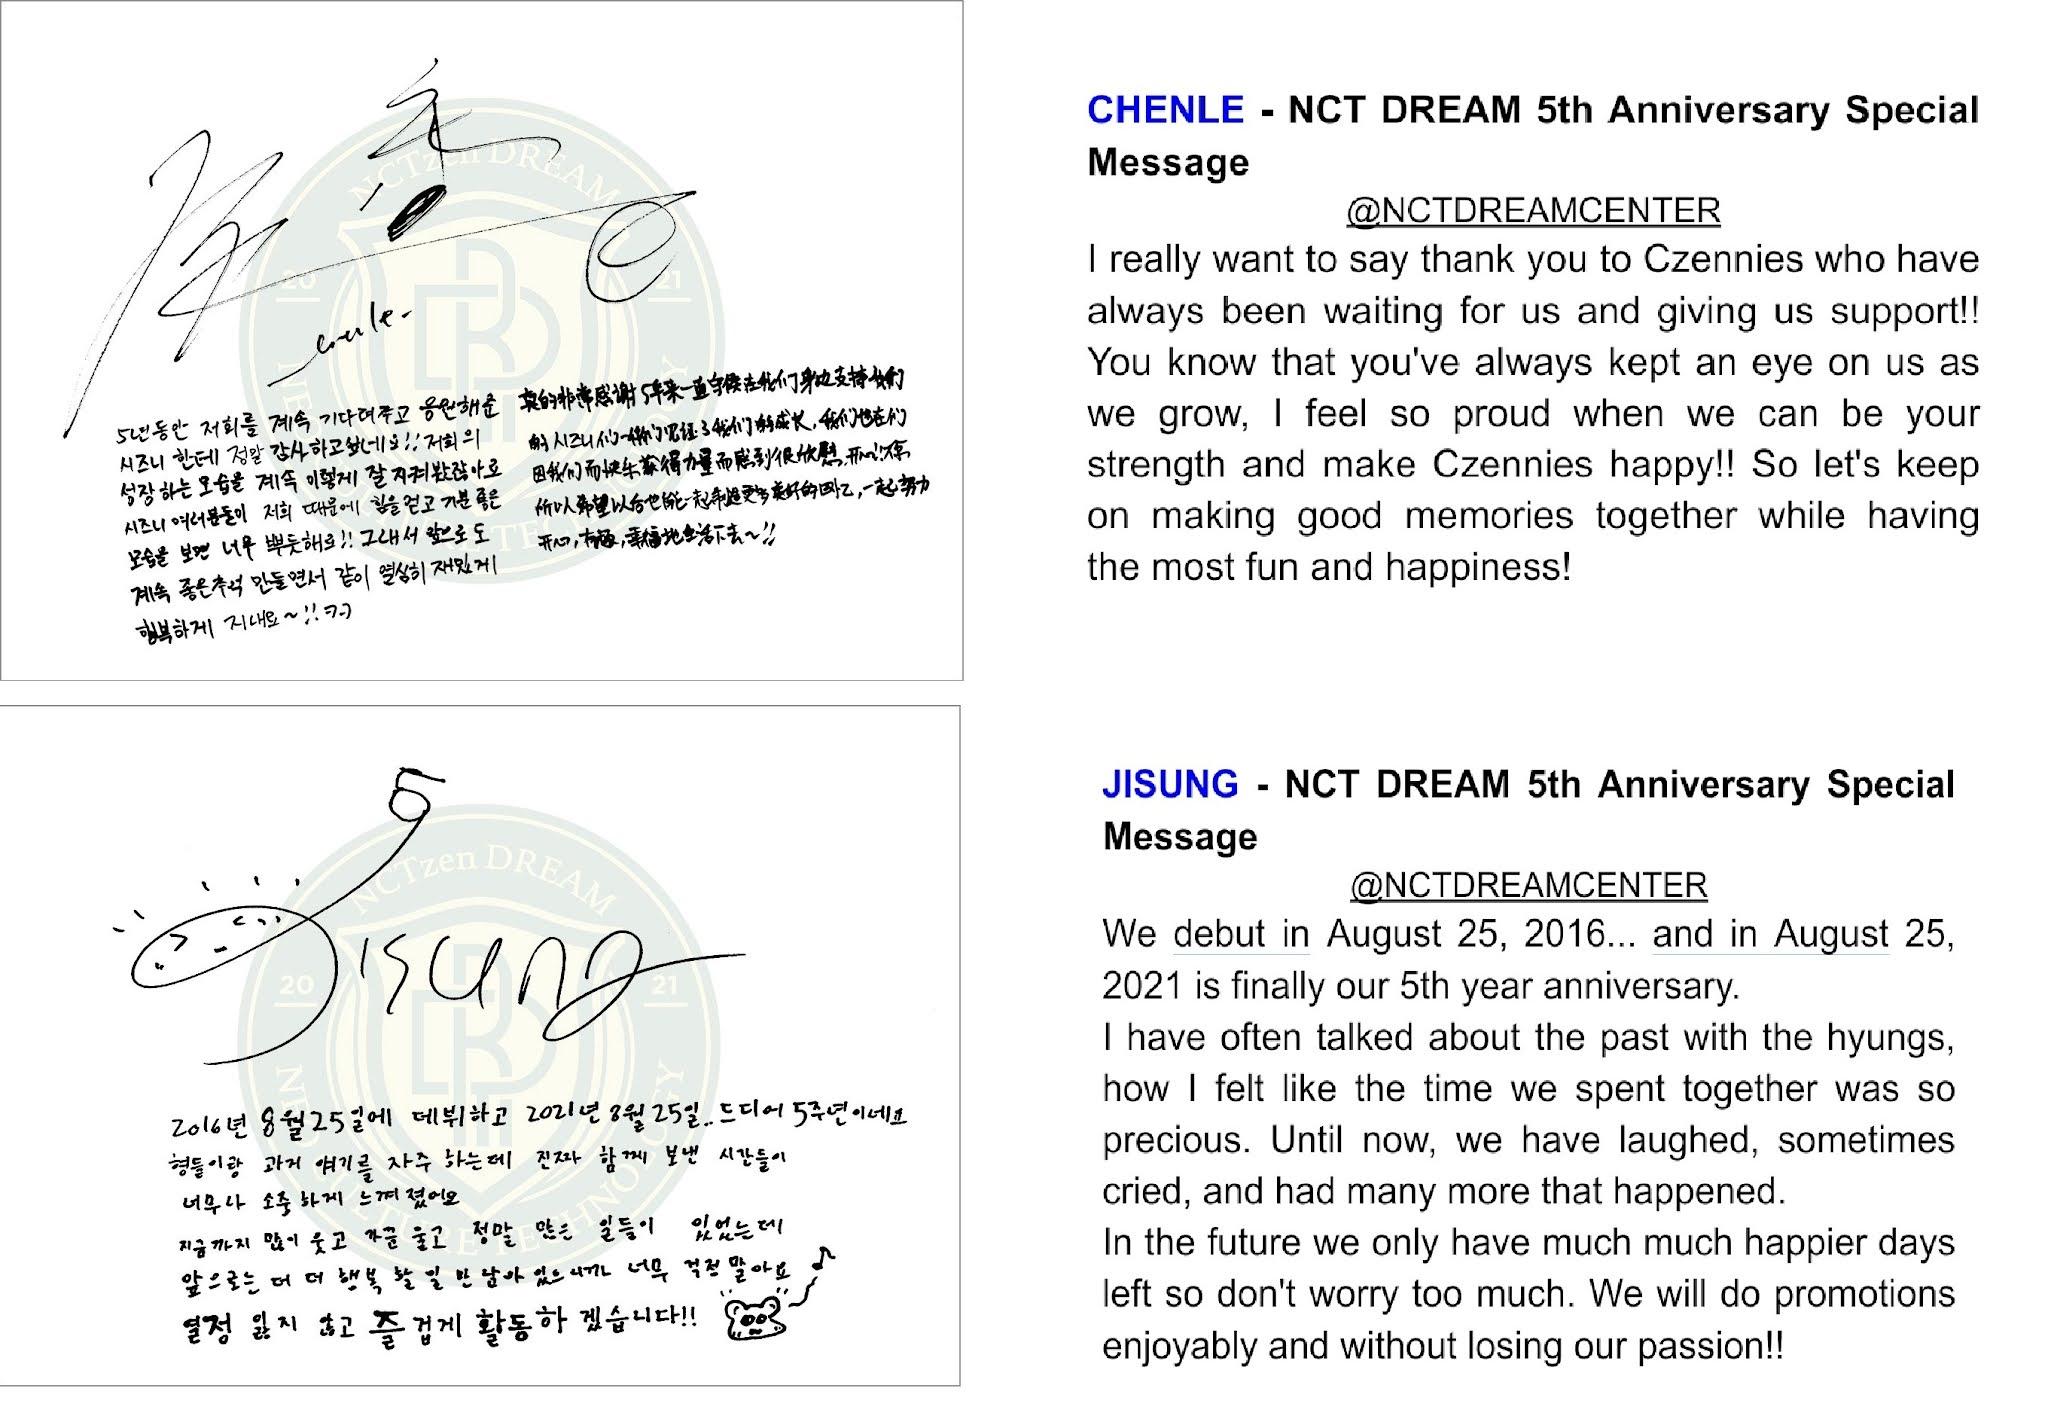 Harapan CHENLE dan JISUNG di 5 tahun NCT DREAM